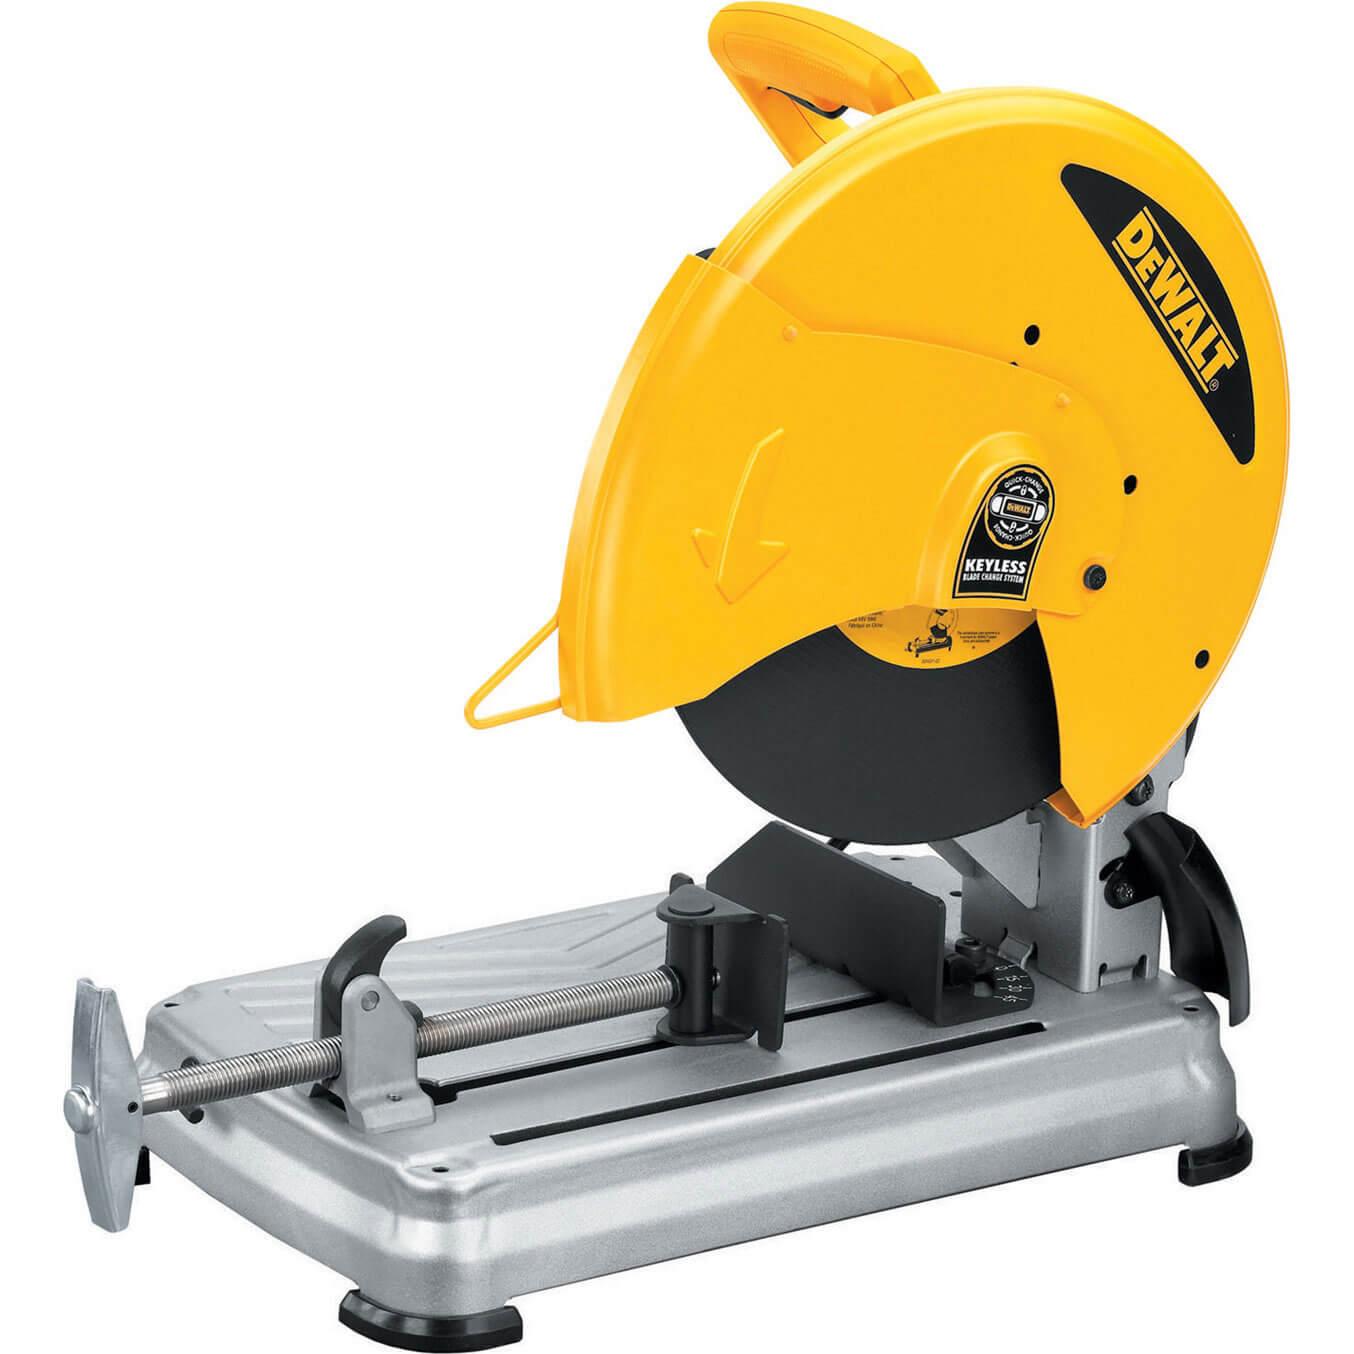 DeWalt D28715 Metal Cut Off Saw 2200w 240v